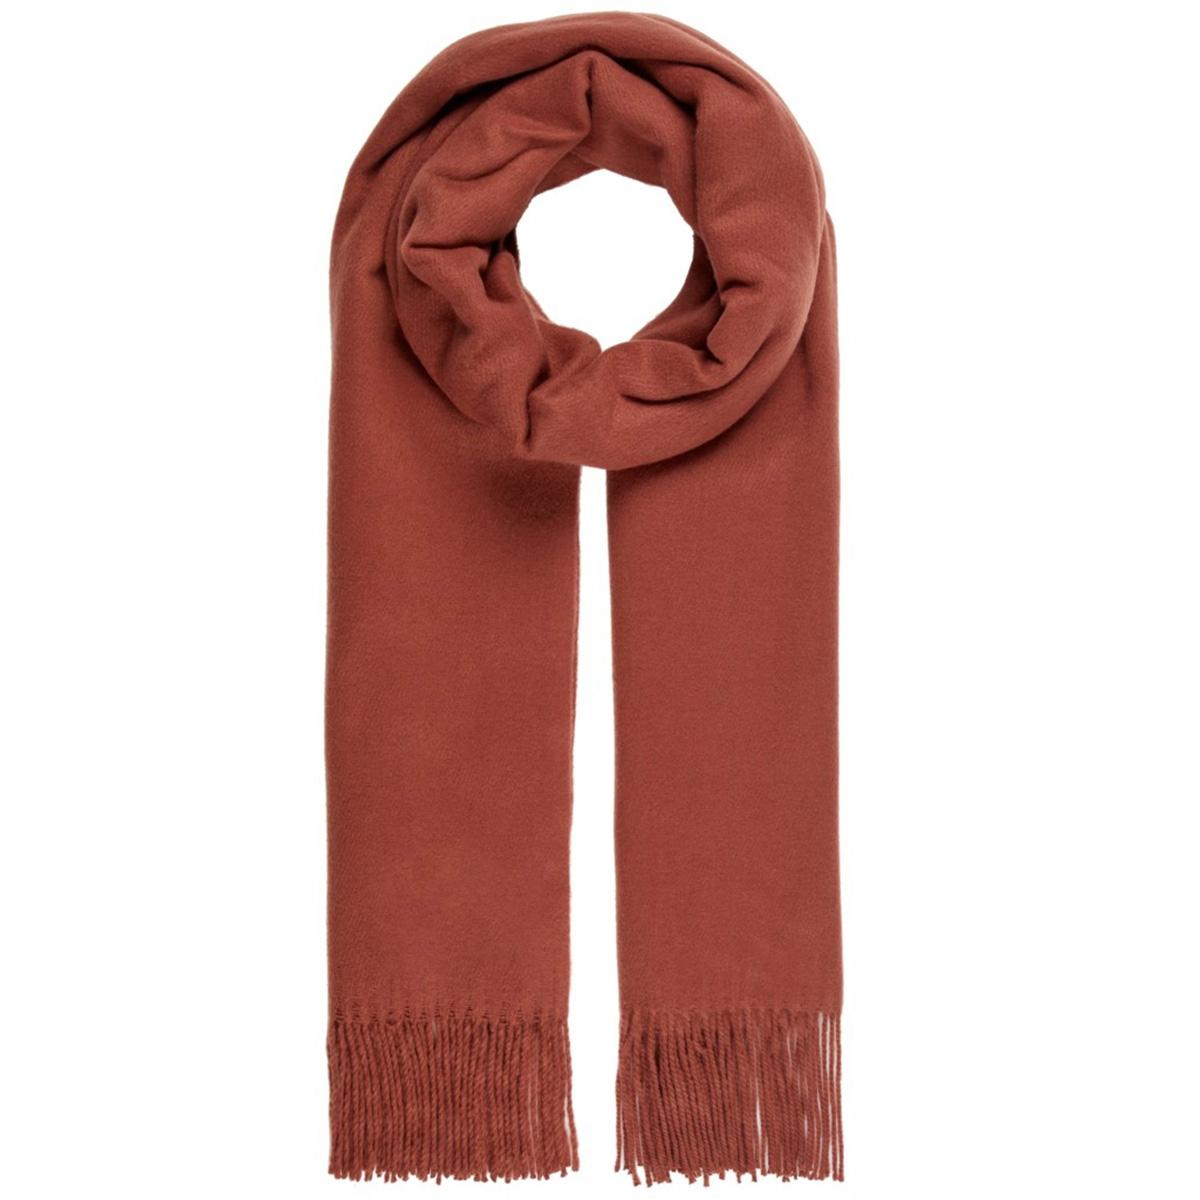 vmimpact long scarf ga color 10215760 vero moda sjaal mahogany